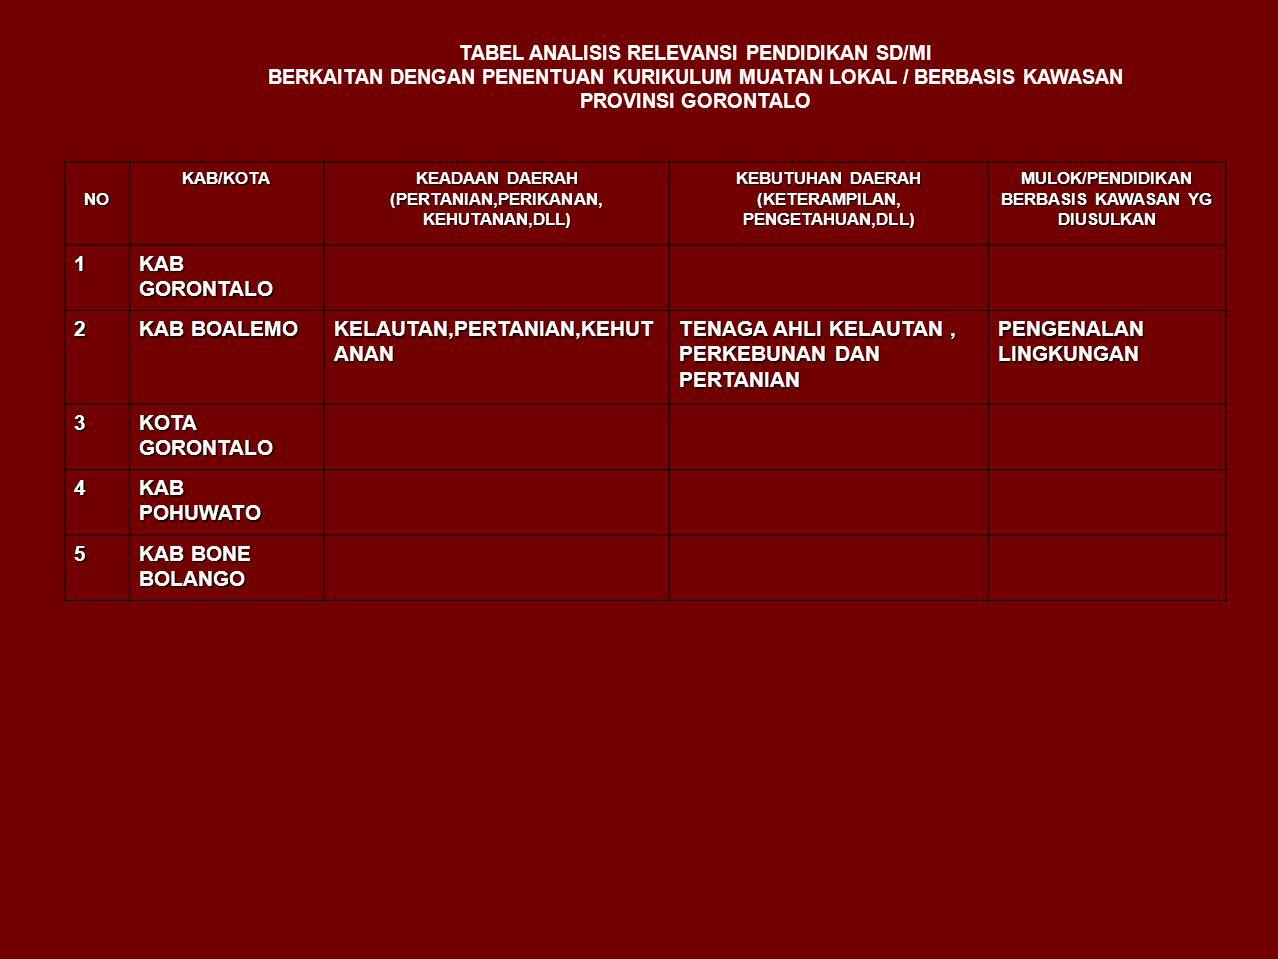 TABEL ANALISIS RELEVANSI PENDIDIKAN SD/MI BERKAITAN DENGAN PENENTUAN KURIKULUM MUATAN LOKAL / BERBASIS KAWASAN PROVINSI GORONTALO NOKAB/KOTA KEADAAN DAERAH (PERTANIAN,PERIKANAN, KEHUTANAN,DLL) KEBUTUHAN DAERAH (KETERAMPILAN, PENGETAHUAN,DLL) MULOK/PENDIDIKAN BERBASIS KAWASAN YG DIUSULKAN 1 KAB GORONTALO 2 KAB BOALEMO KELAUTAN,PERTANIAN,KEHUT ANAN TENAGA AHLI KELAUTAN, PERKEBUNAN DAN PERTANIAN PENGENALAN LINGKUNGAN 3 KOTA GORONTALO 4 KAB POHUWATO 5 KAB BONE BOLANGO